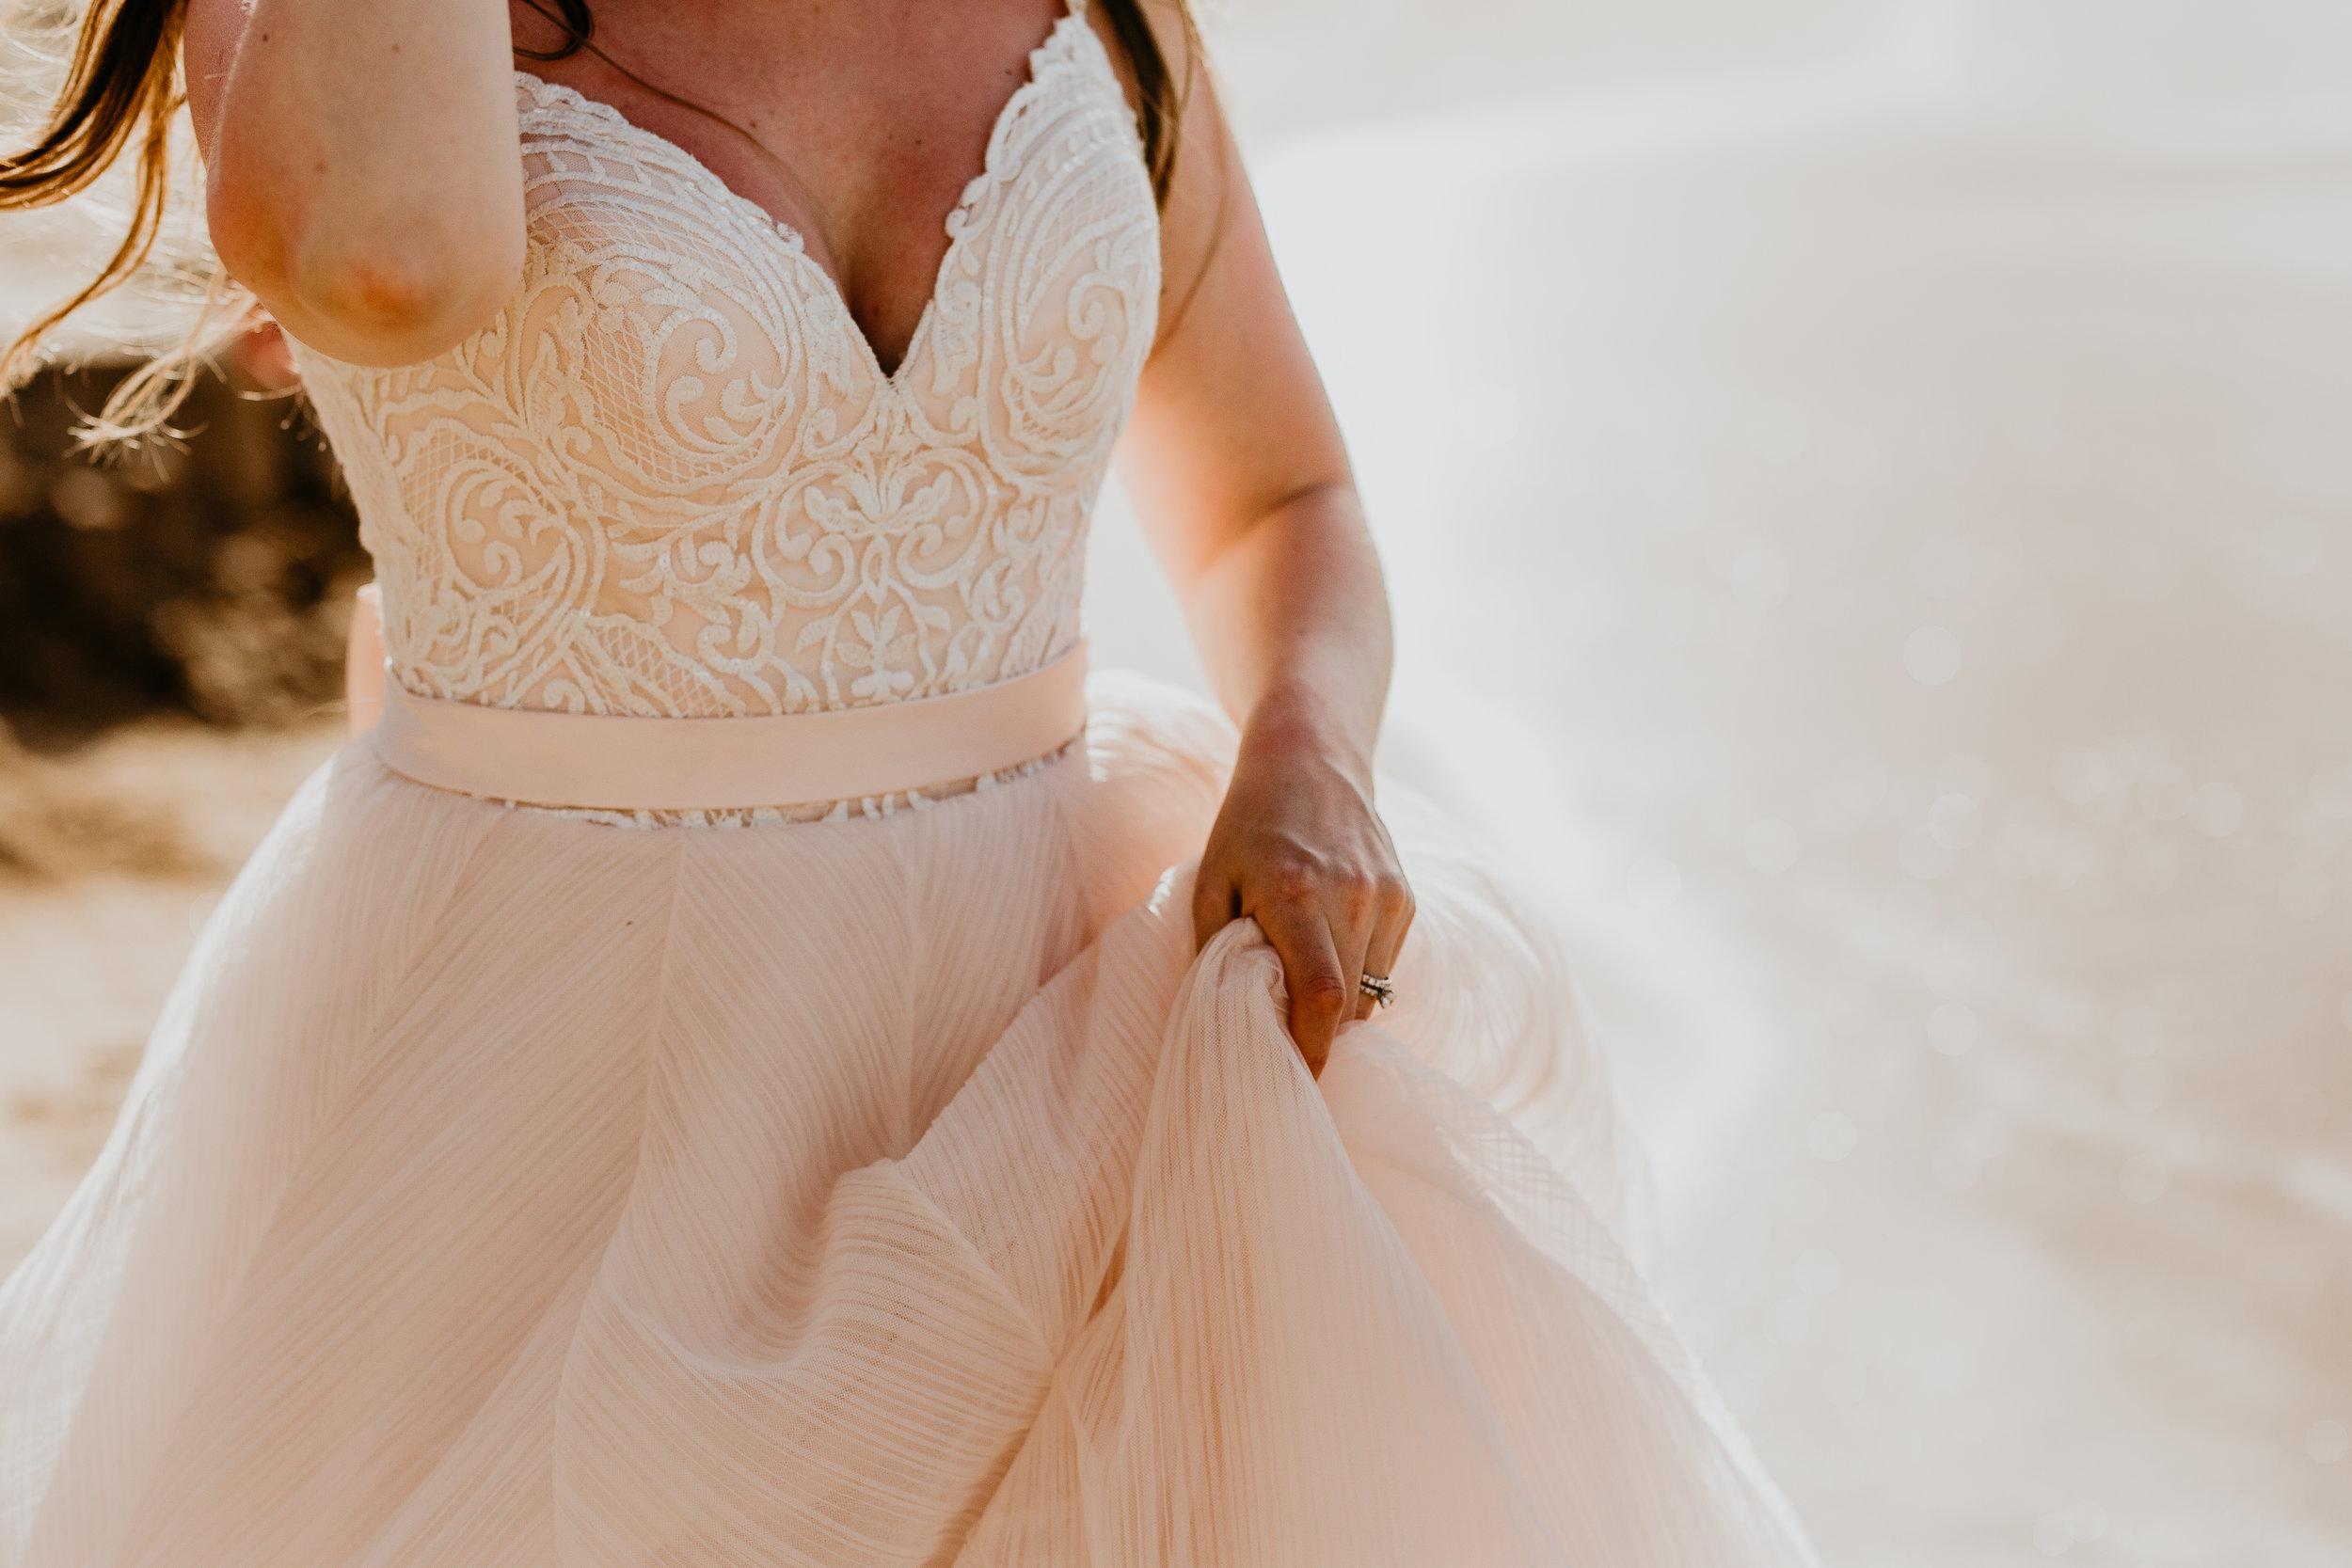 nicole-daacke-photography-destination-wedding-in-st-lucia-sandals-la-toc-intimate-island-wedding-carribean-elopement-photographer-chill-island-wedding-96.jpg